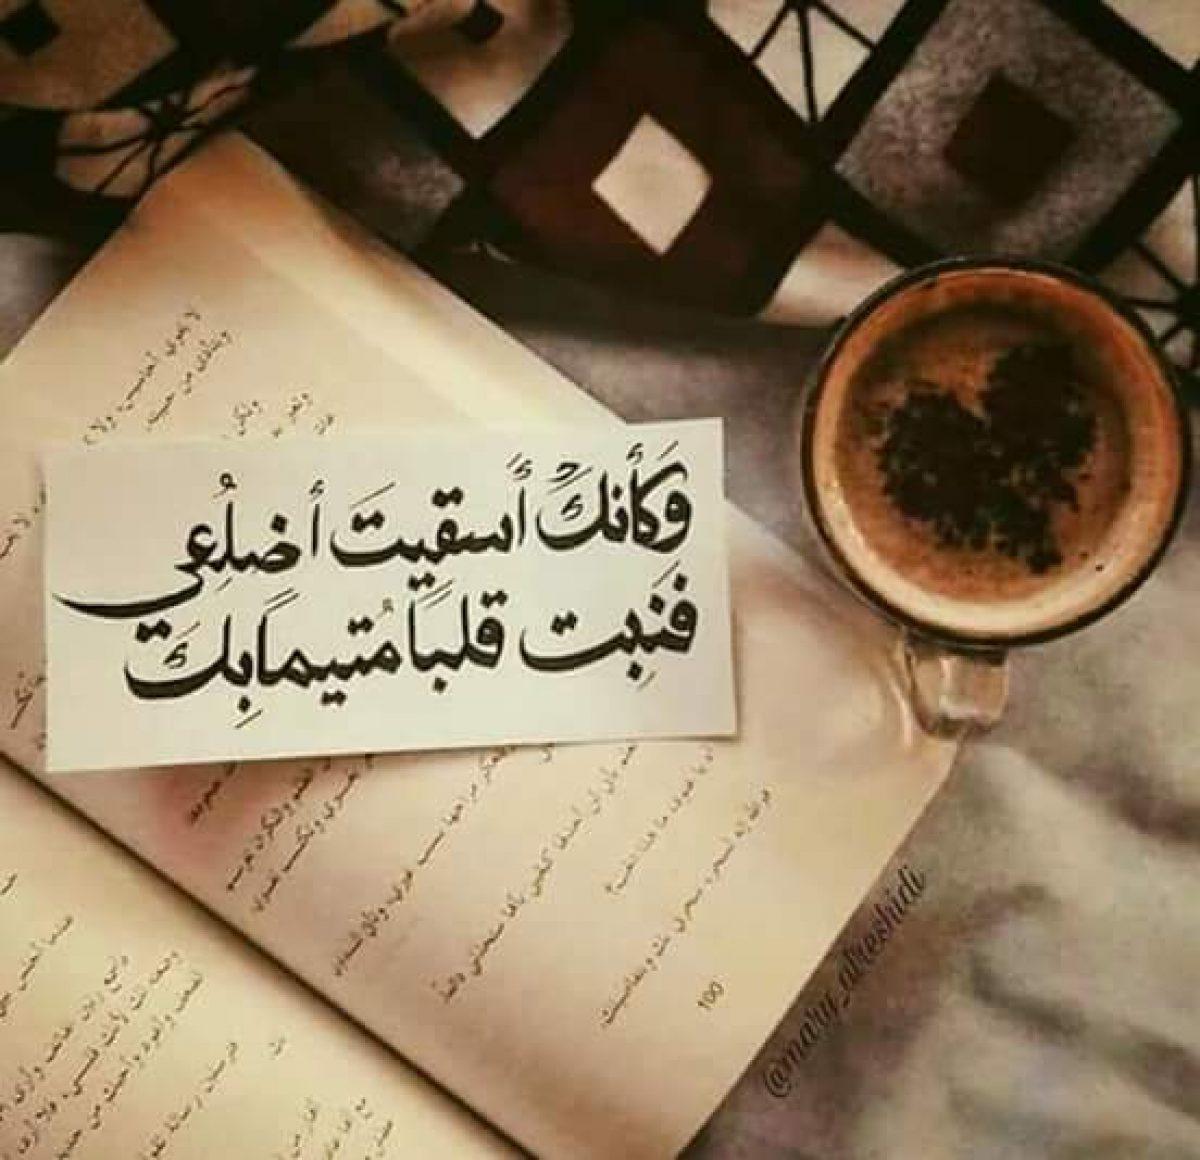 بالصور رسائل حب ورومنسيه , كلمات رومانسيه بين الاحبه unnamed file 255